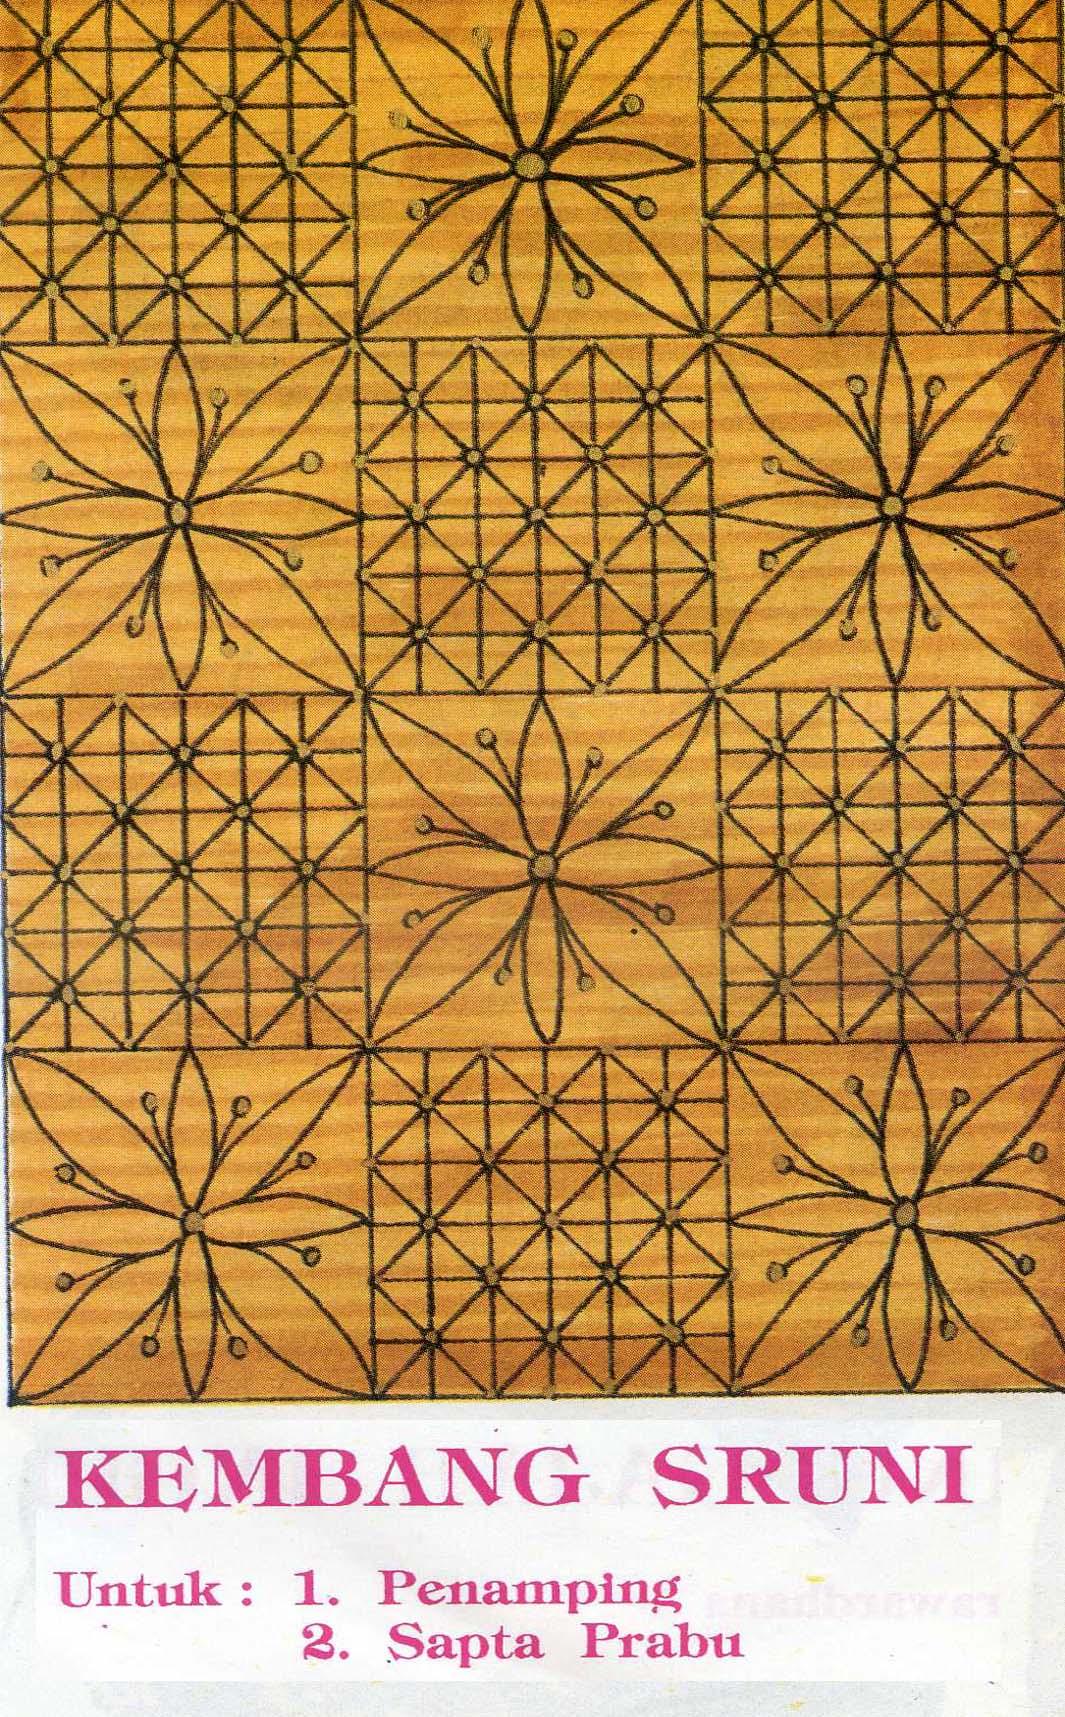 Batik Kalimantan Timur Yang Mudah Digambar : batik, kalimantan, timur, mudah, digambar, Gambar, Batik, Timur, Mudah, Digambar, Paling, Keren, Pixabay